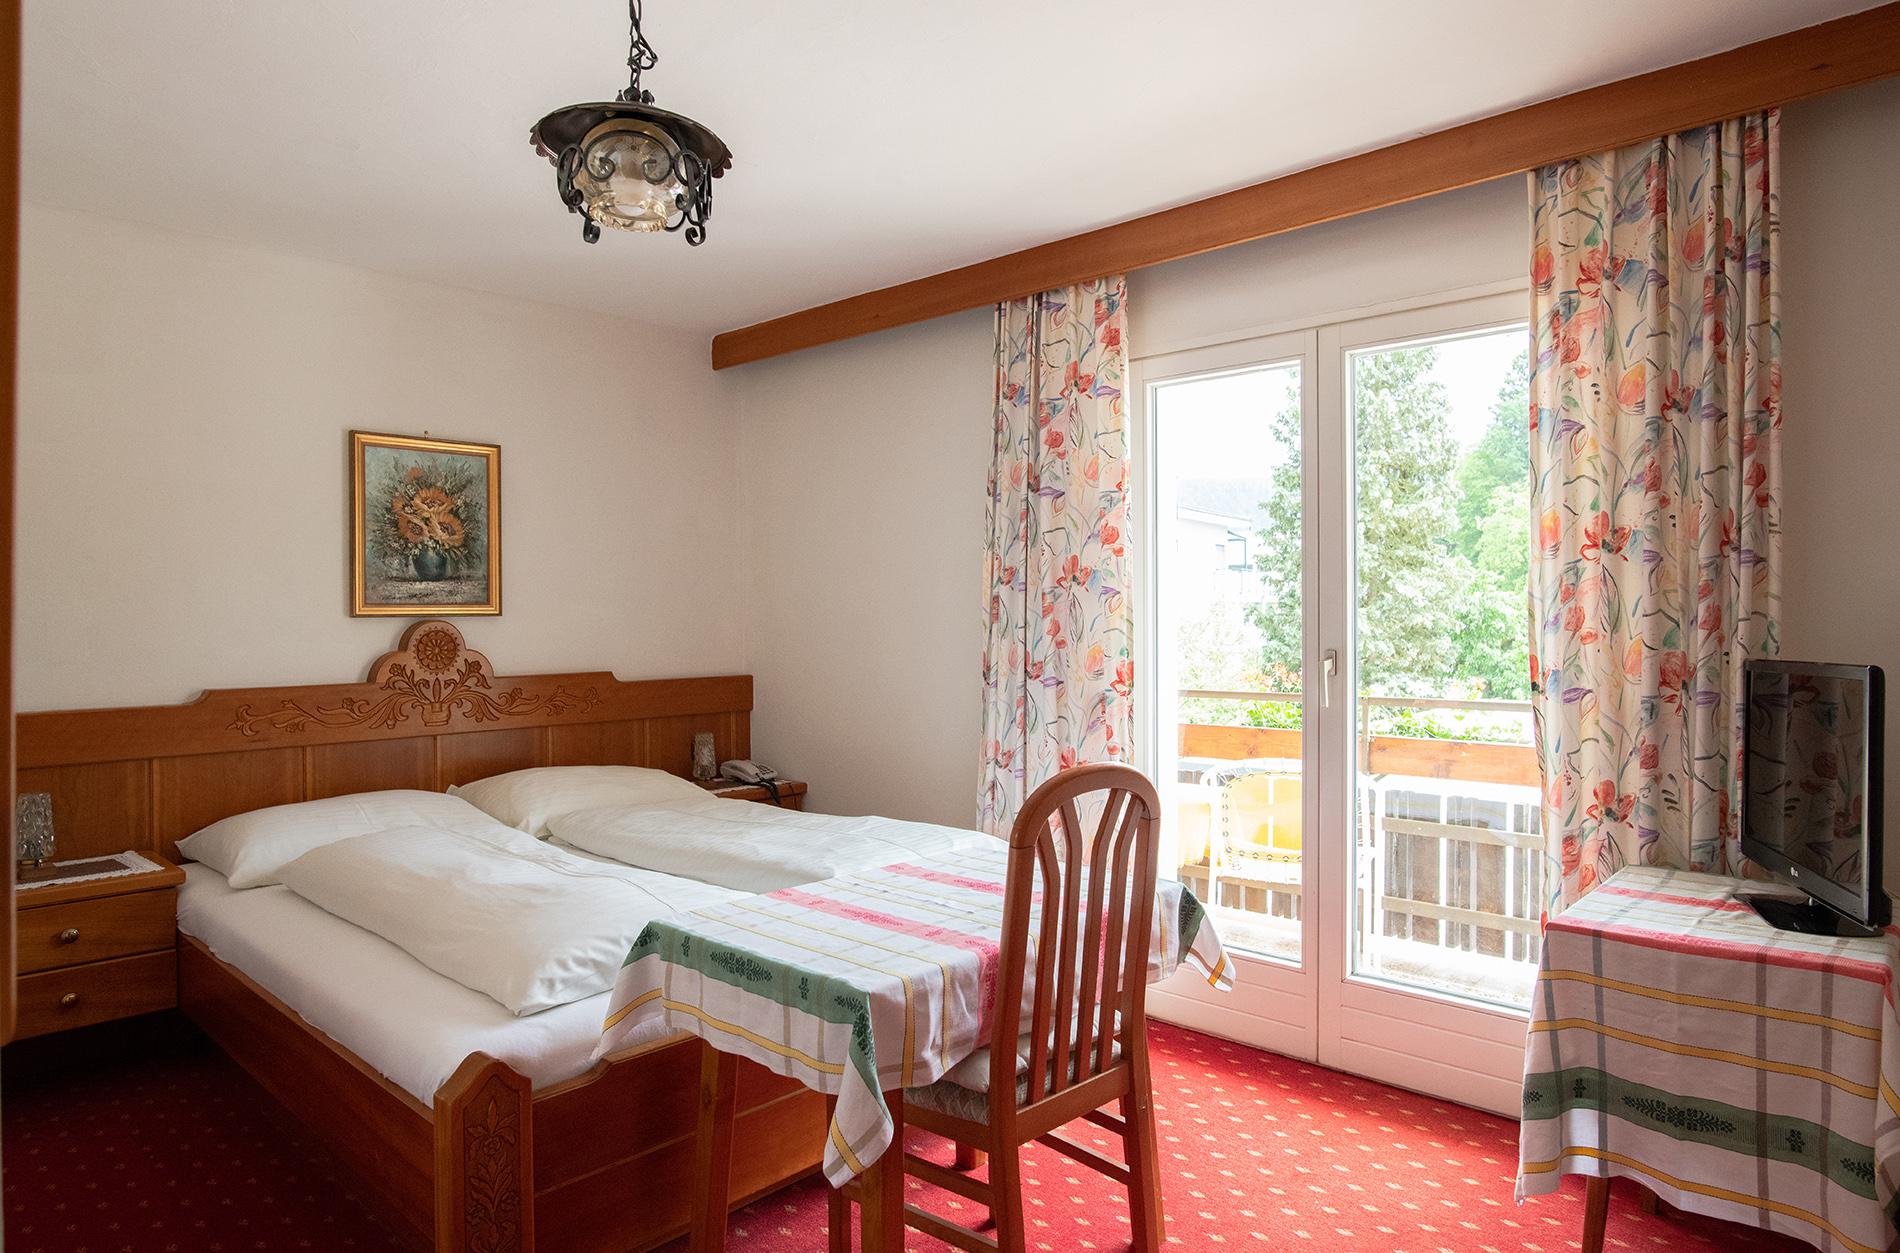 KLU16066 Hotel Rosenheim kétágyas szoba erkéllyel